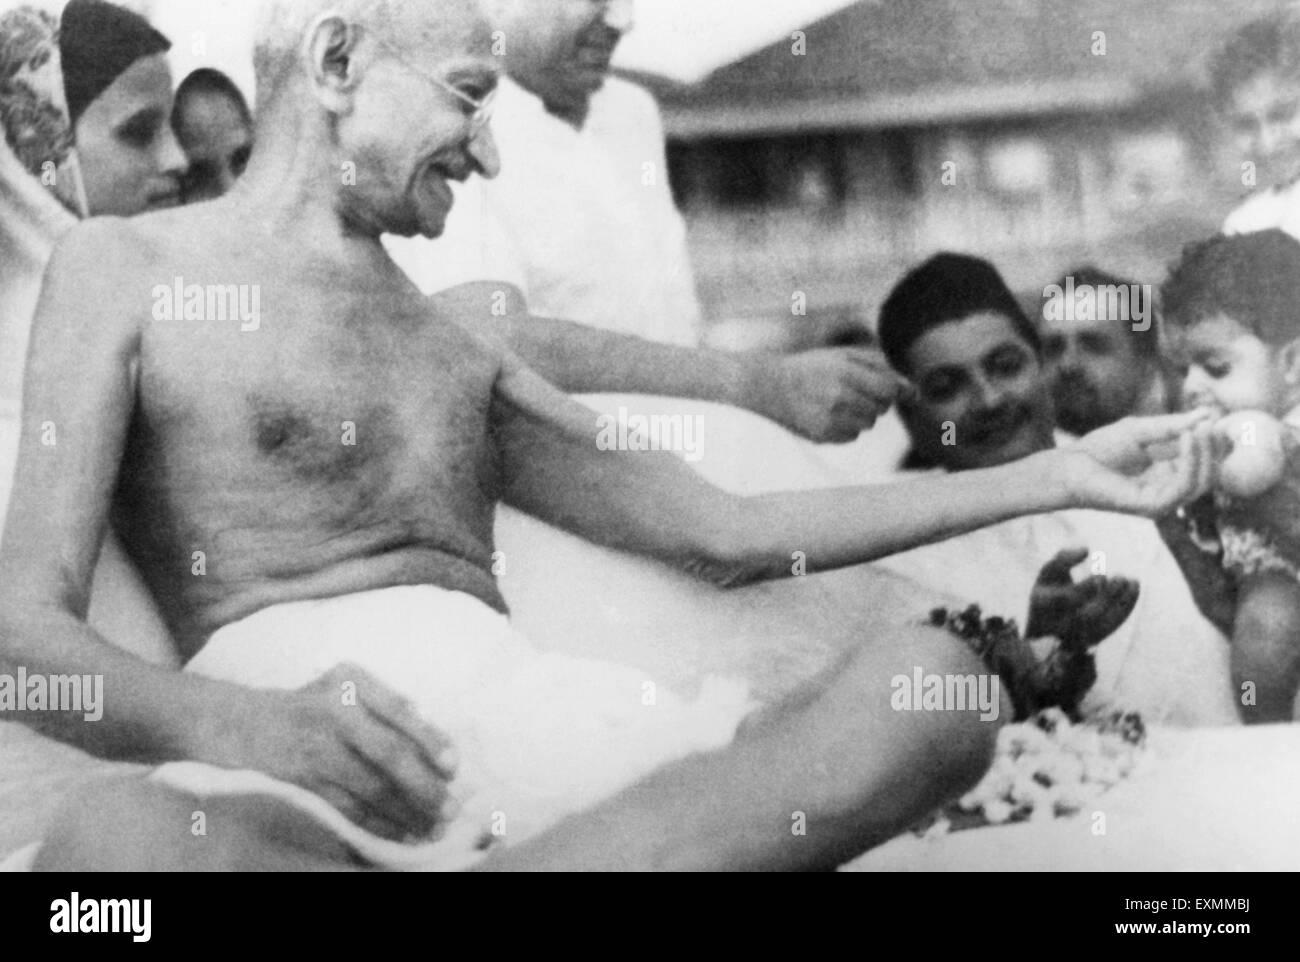 Mahatma Gandhi ; distributing fruits to children at Juhu Beach bombay india May 1944 - Stock Image